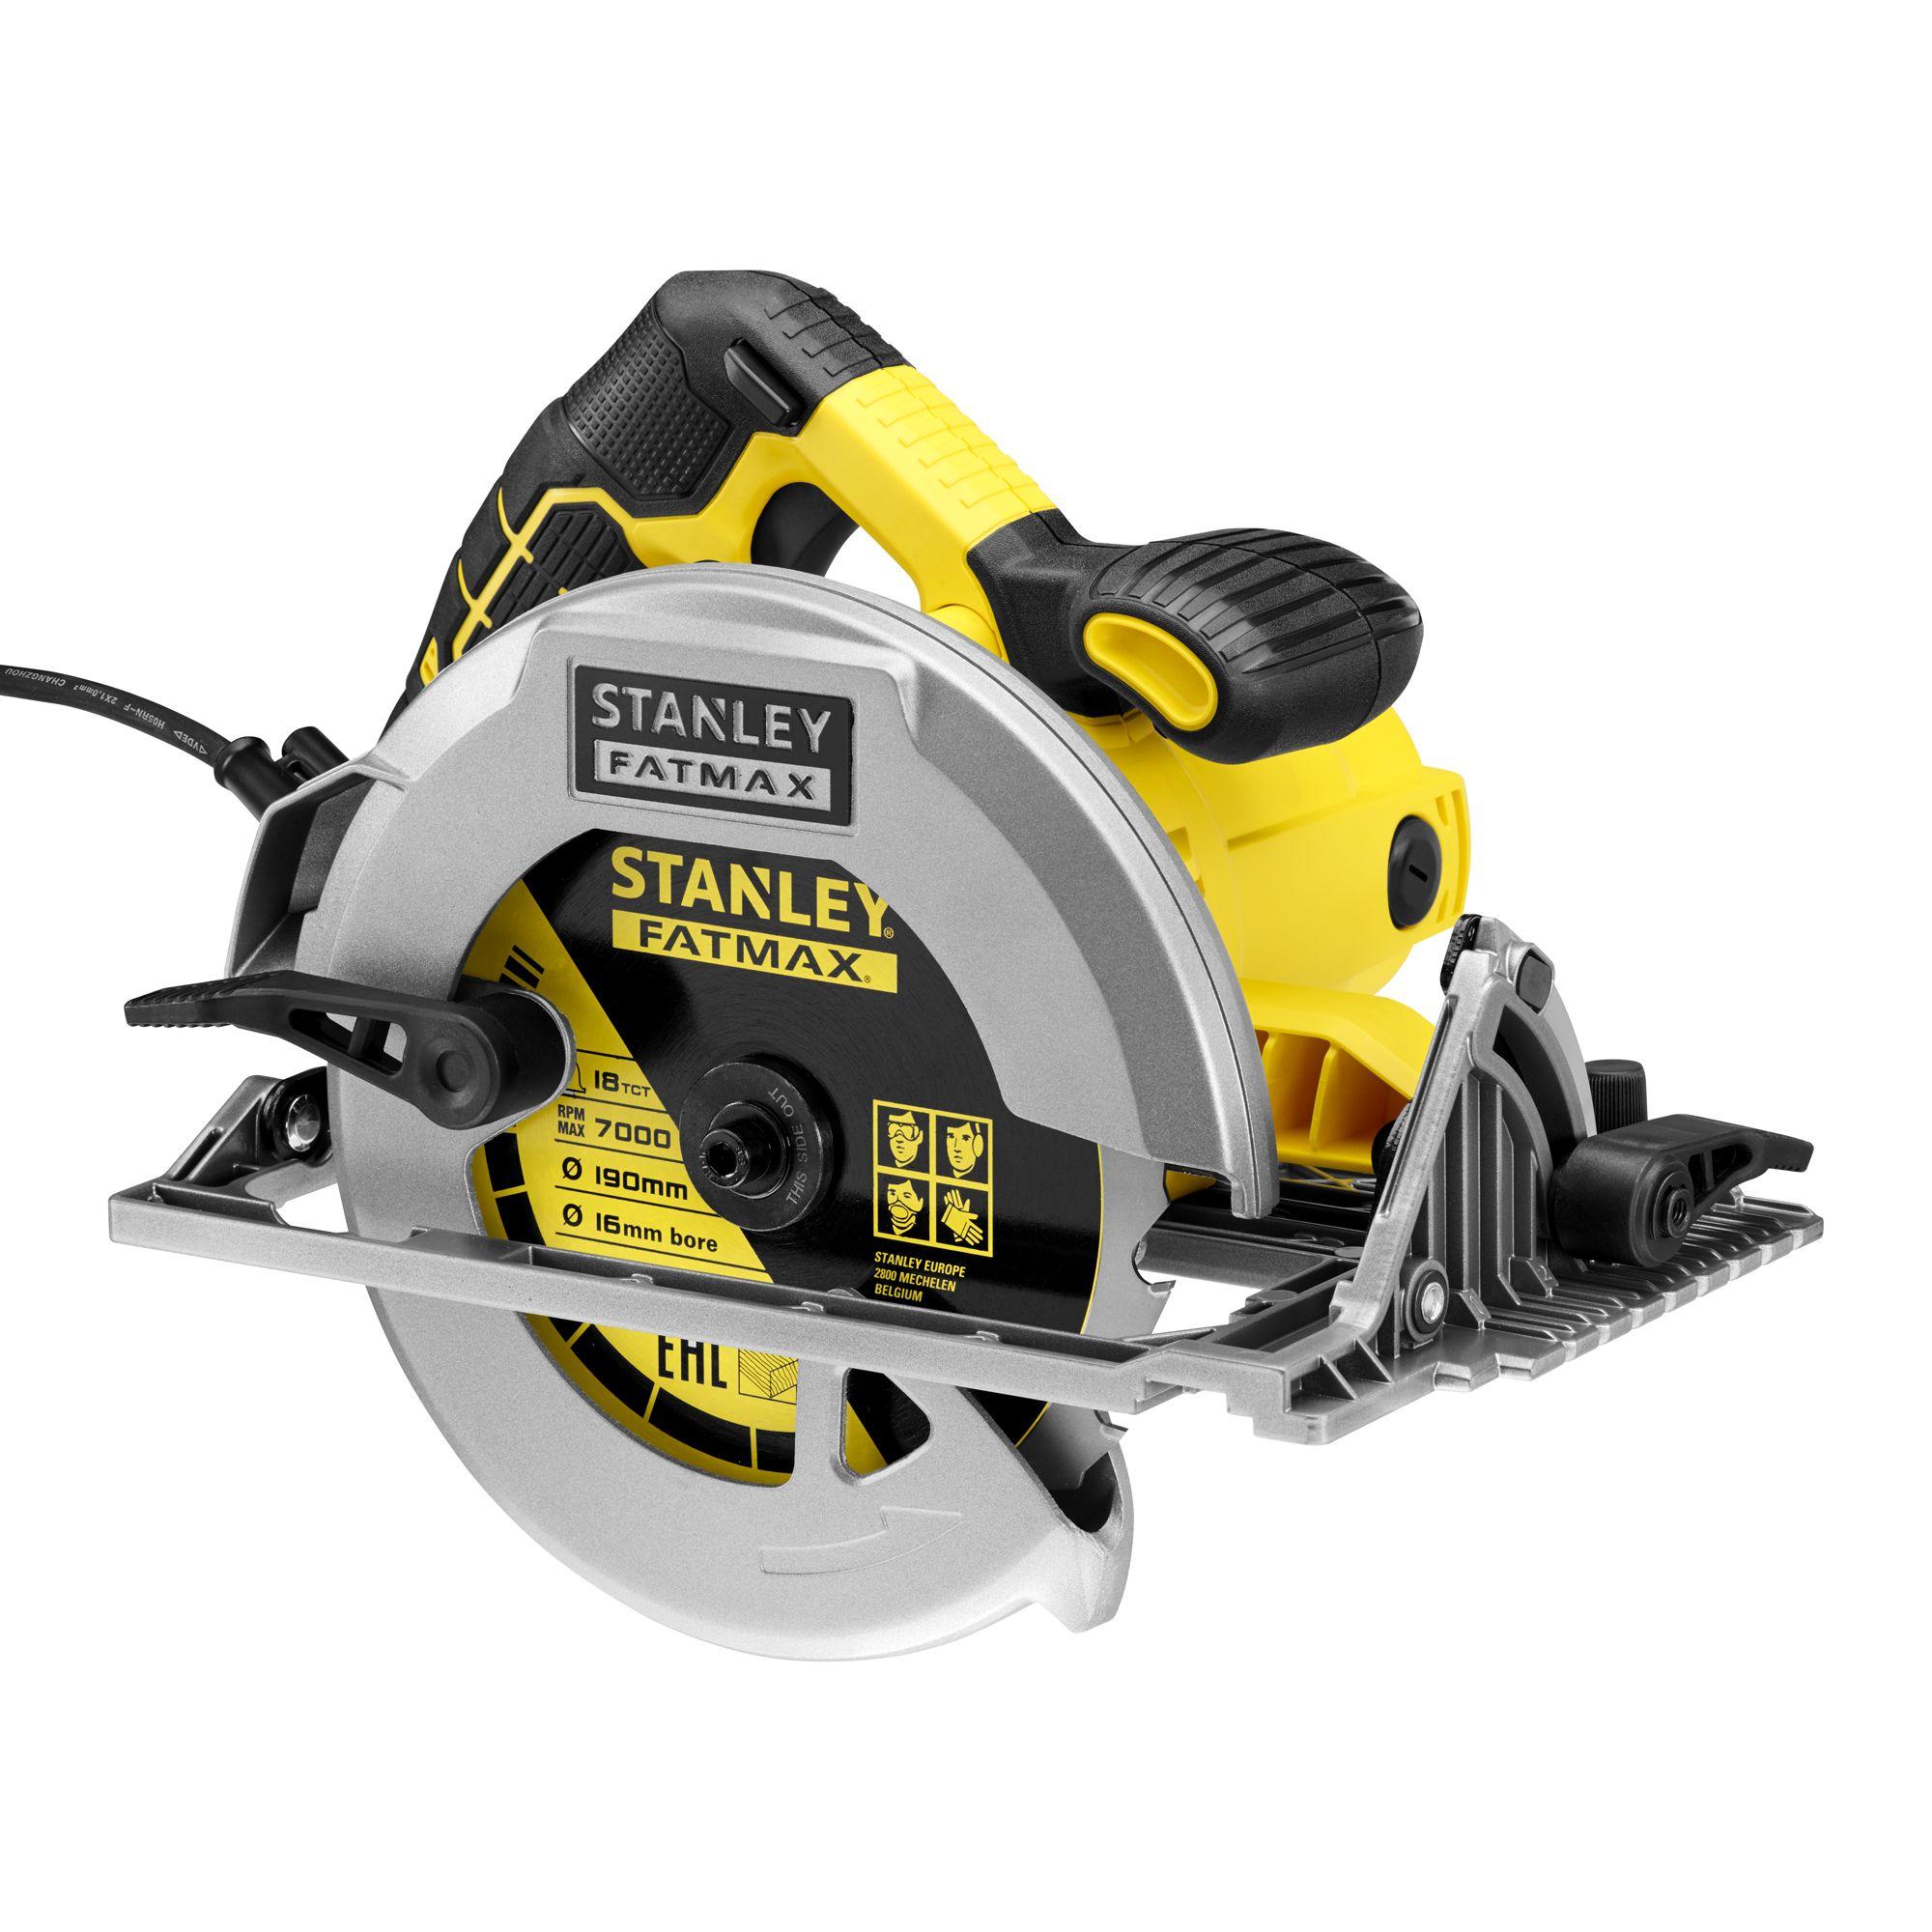 Stanley FatMax Fatmax 1650W 230V 190mm Circular Saw KFFMES301-GB |  Departments | DIY at B&Q